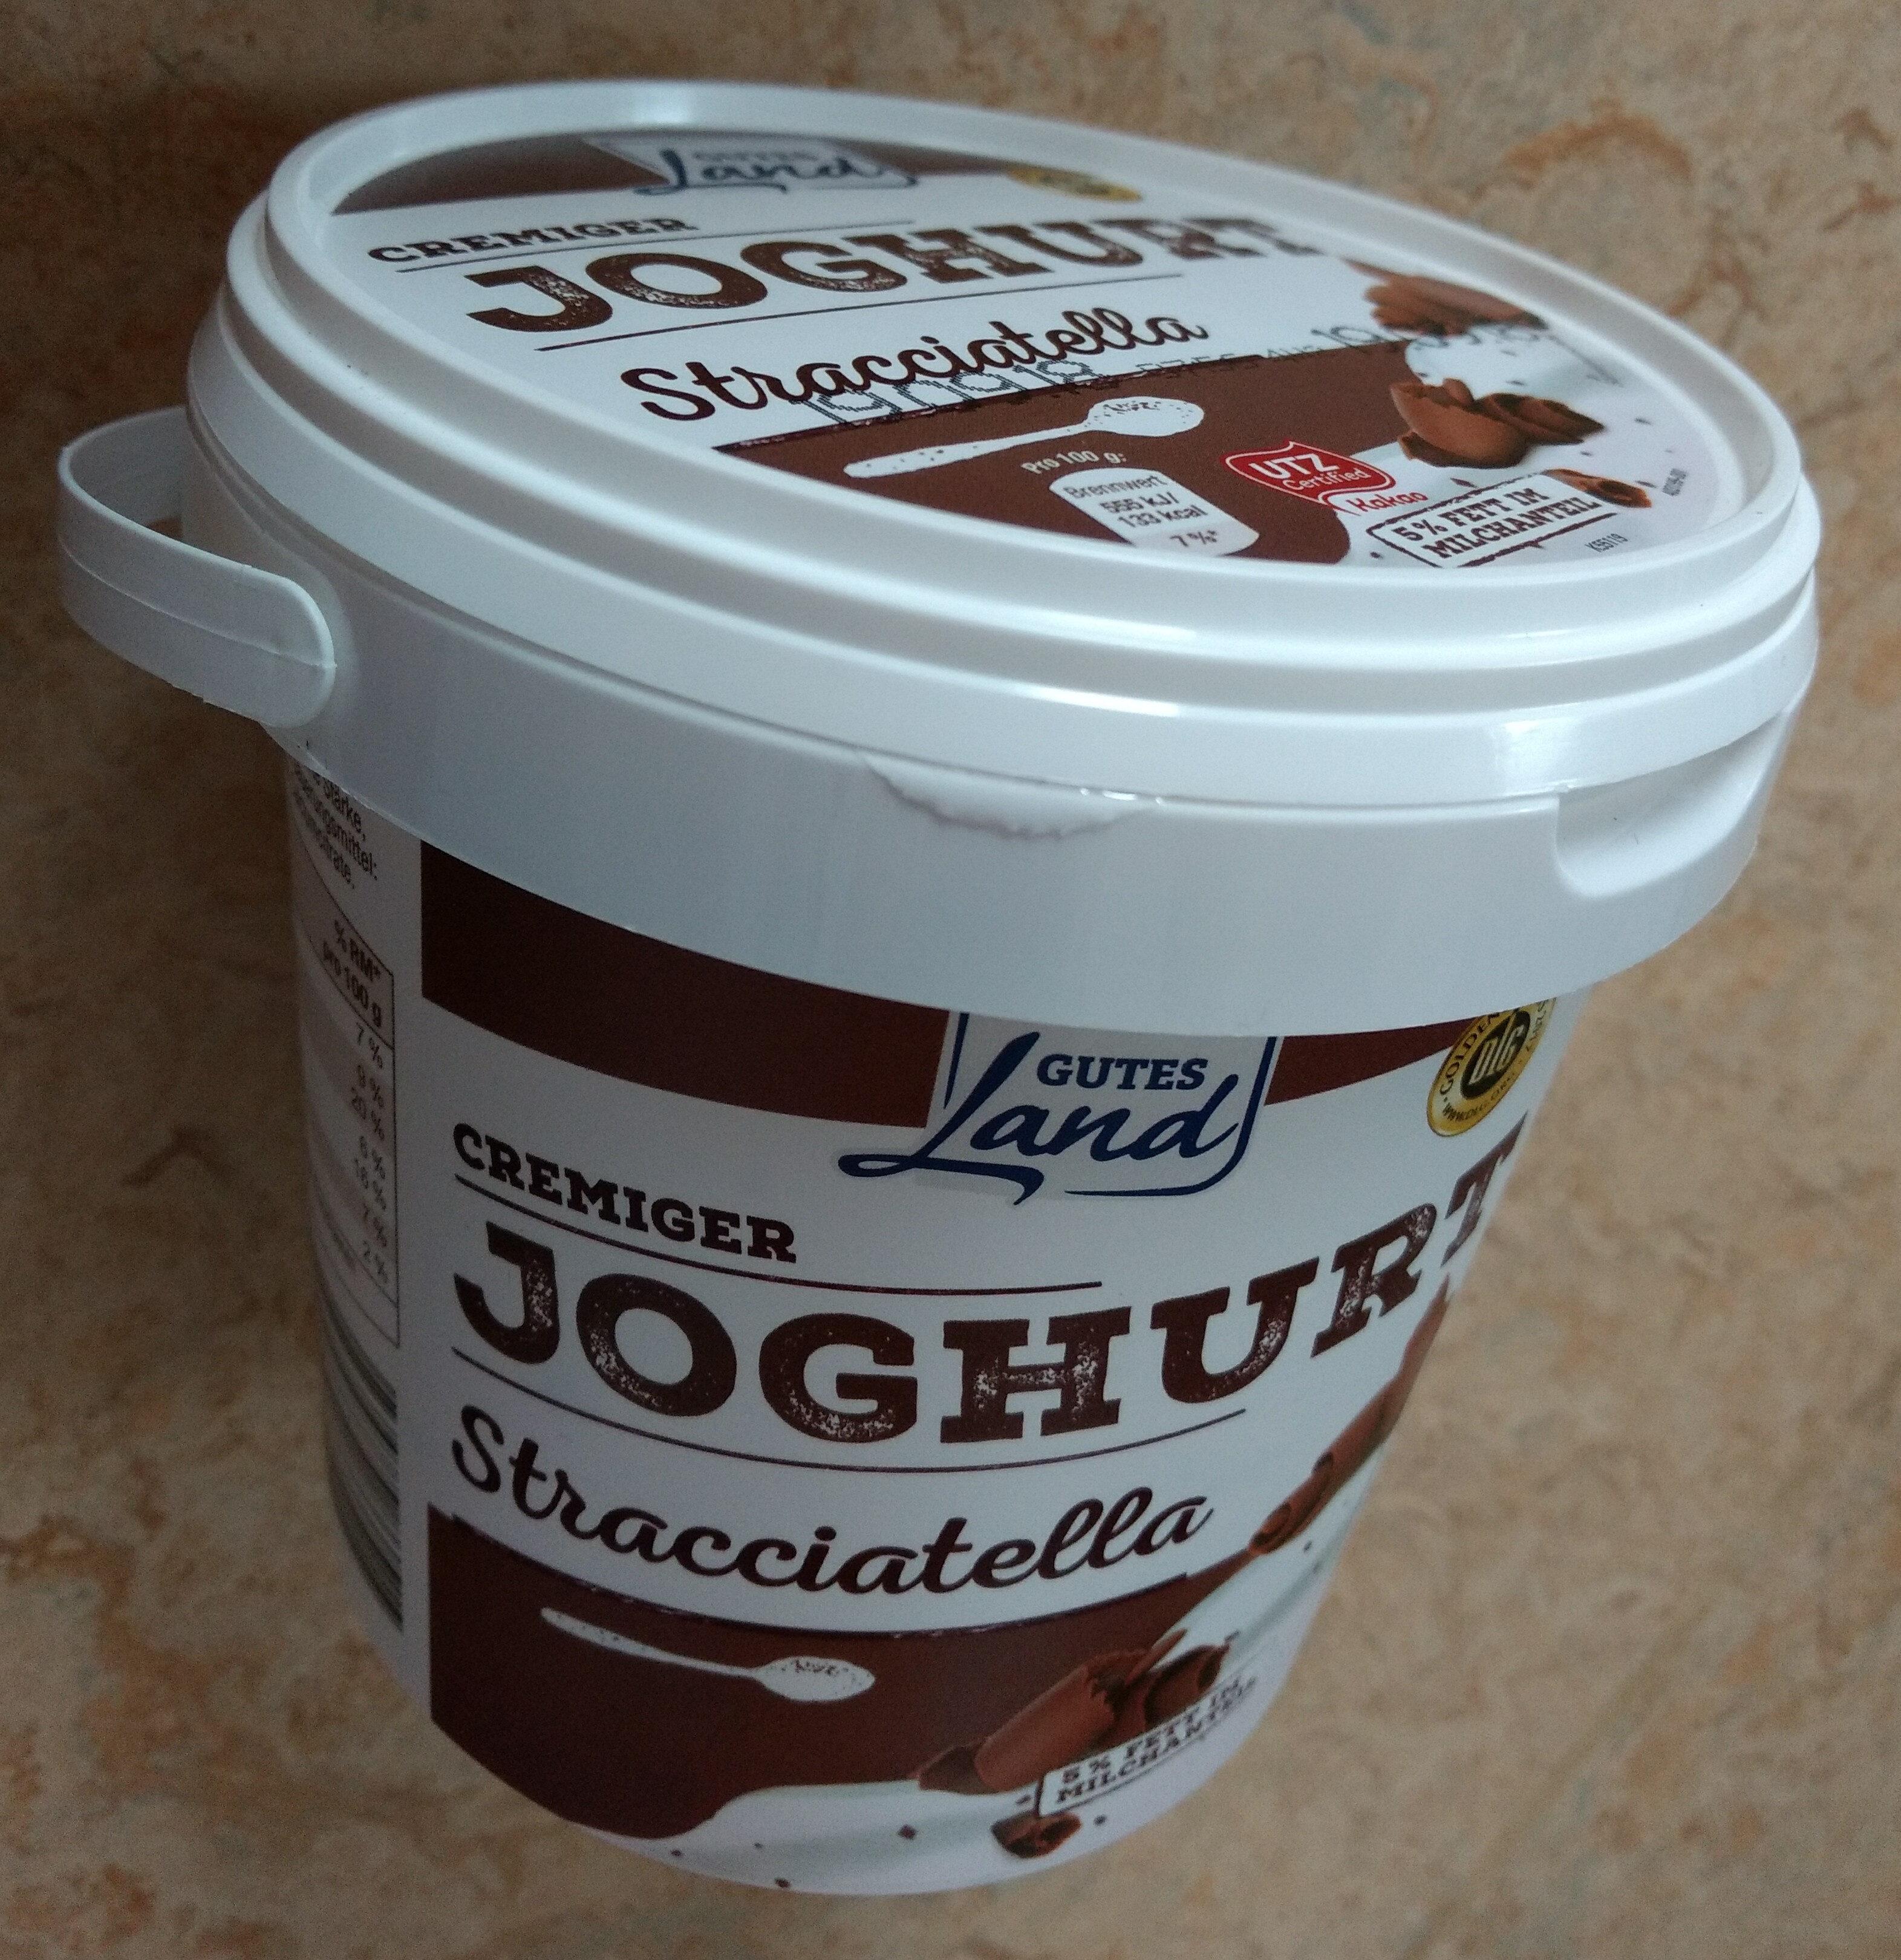 Cremiger Joghurt Stracciatella Gutes Land - Product - de